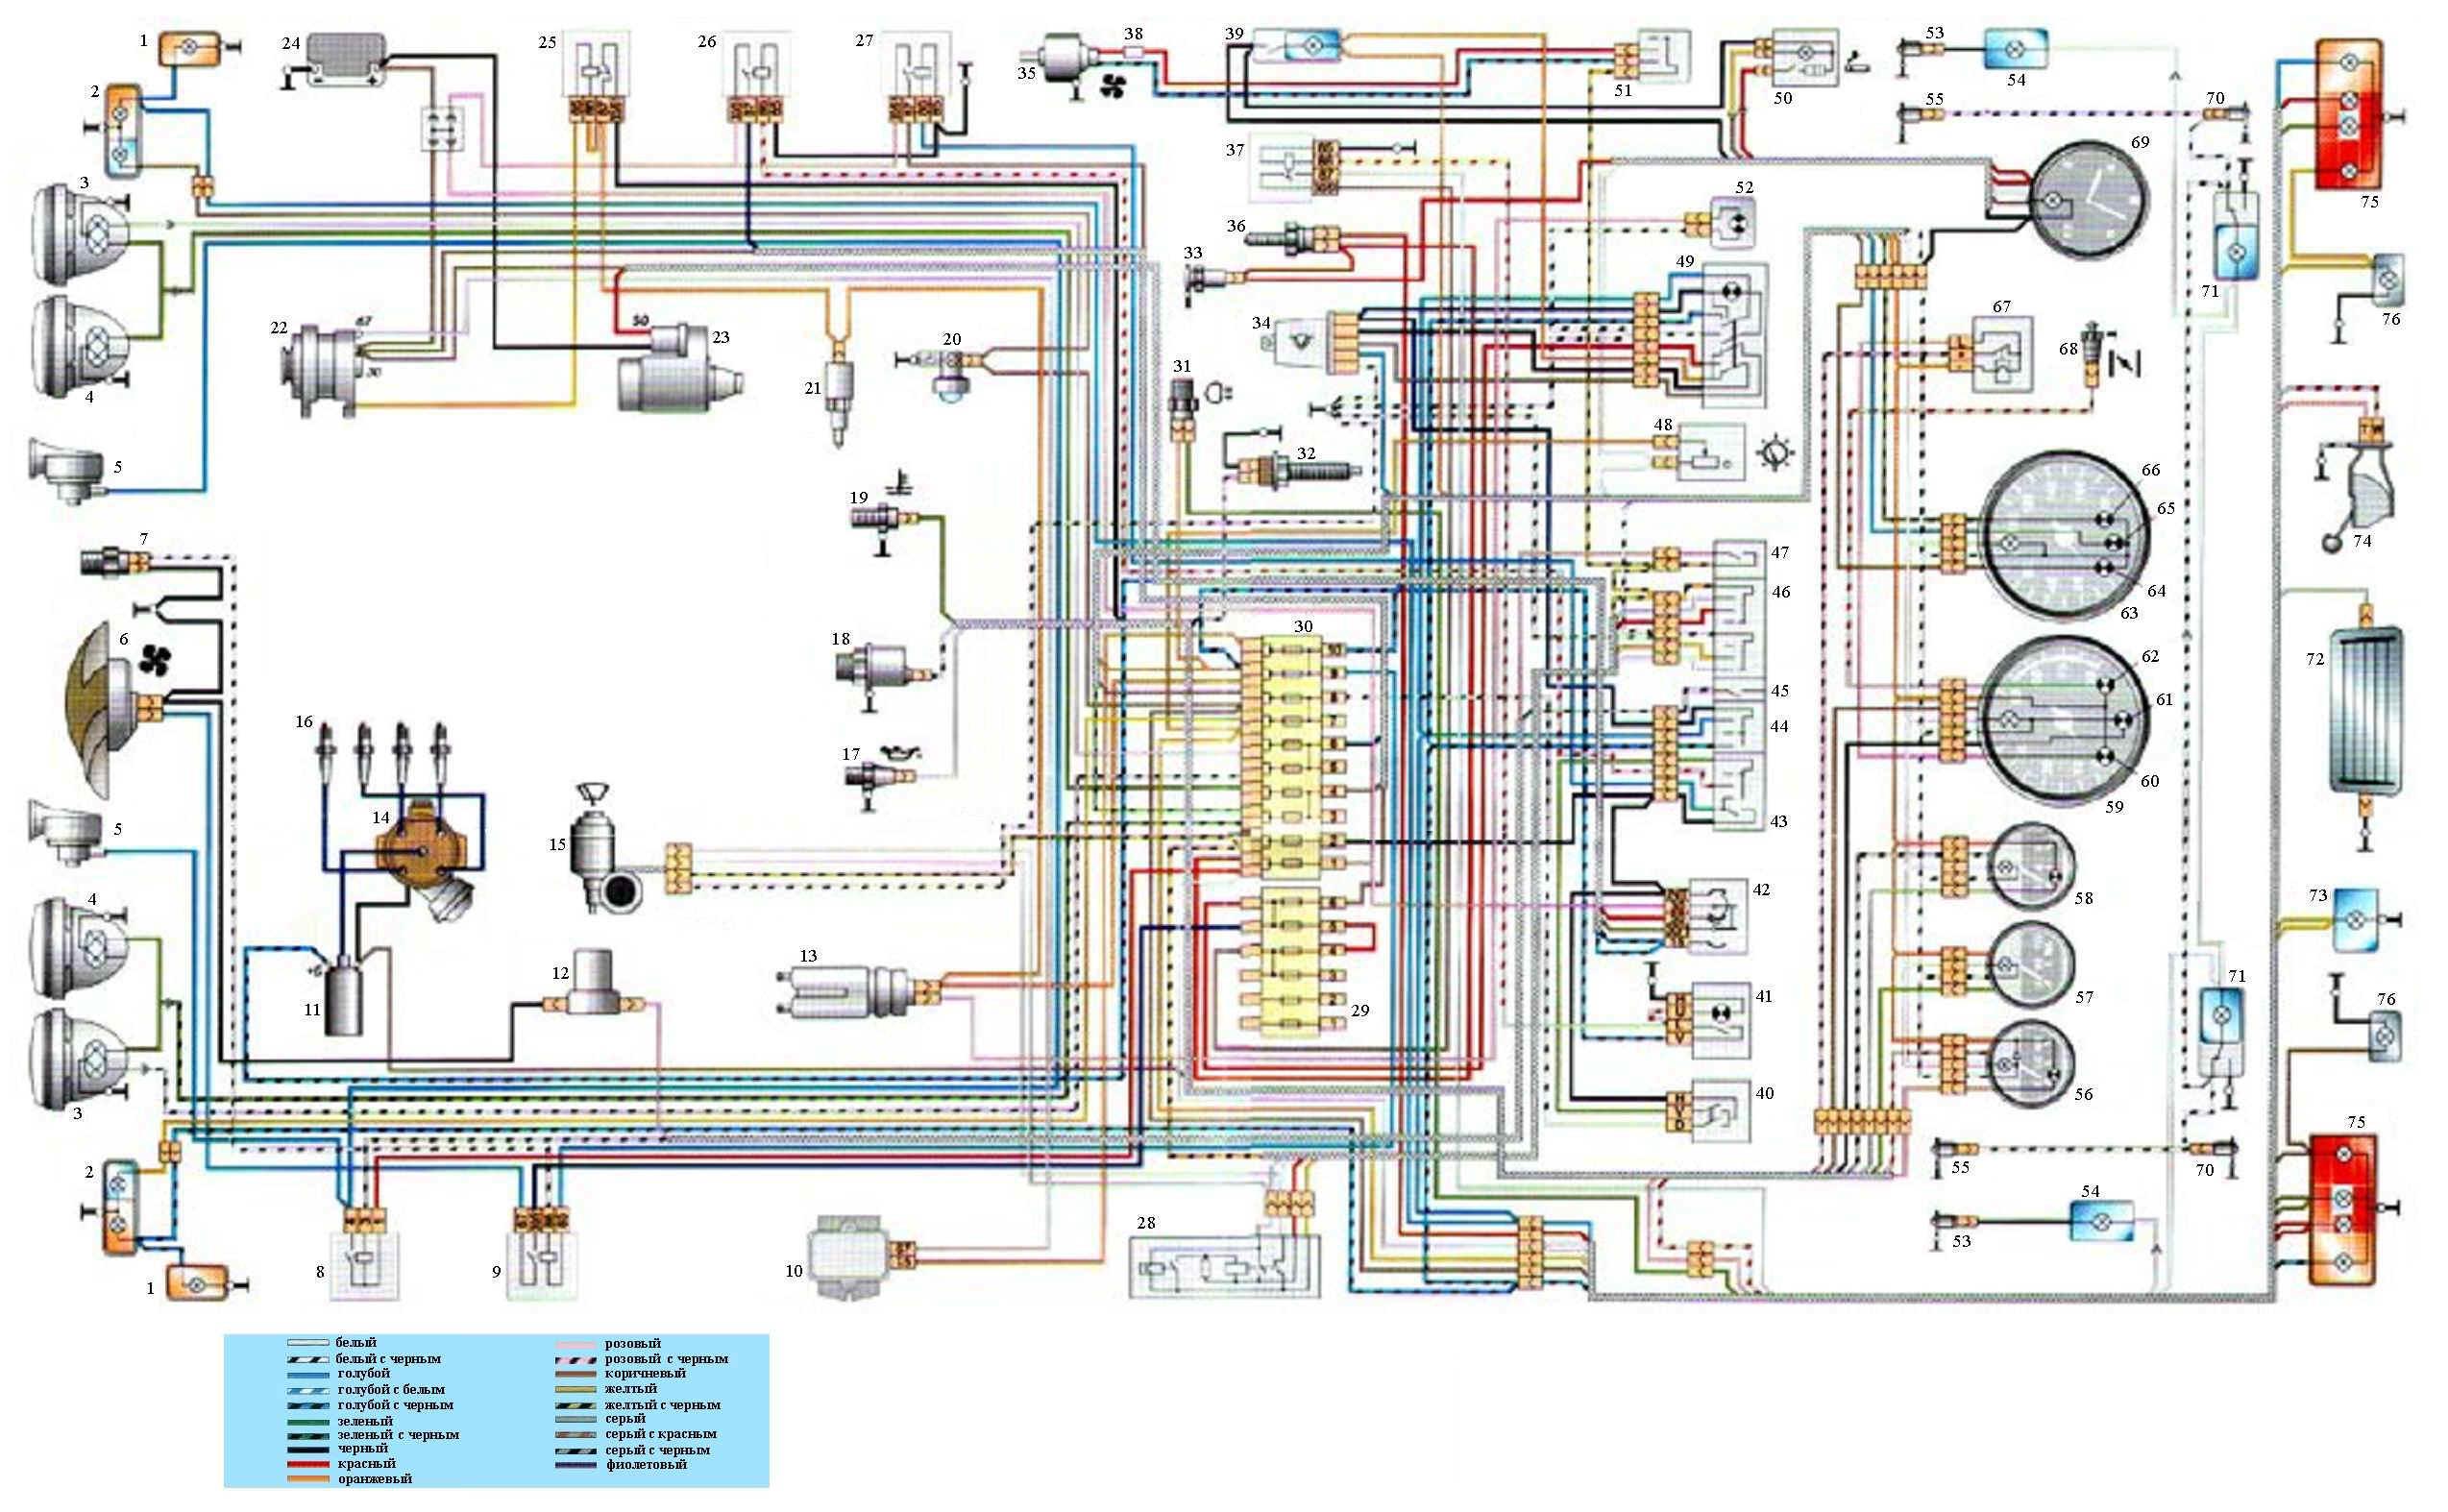 Схема электрооборудования автомобиля ВАЗ 2106.